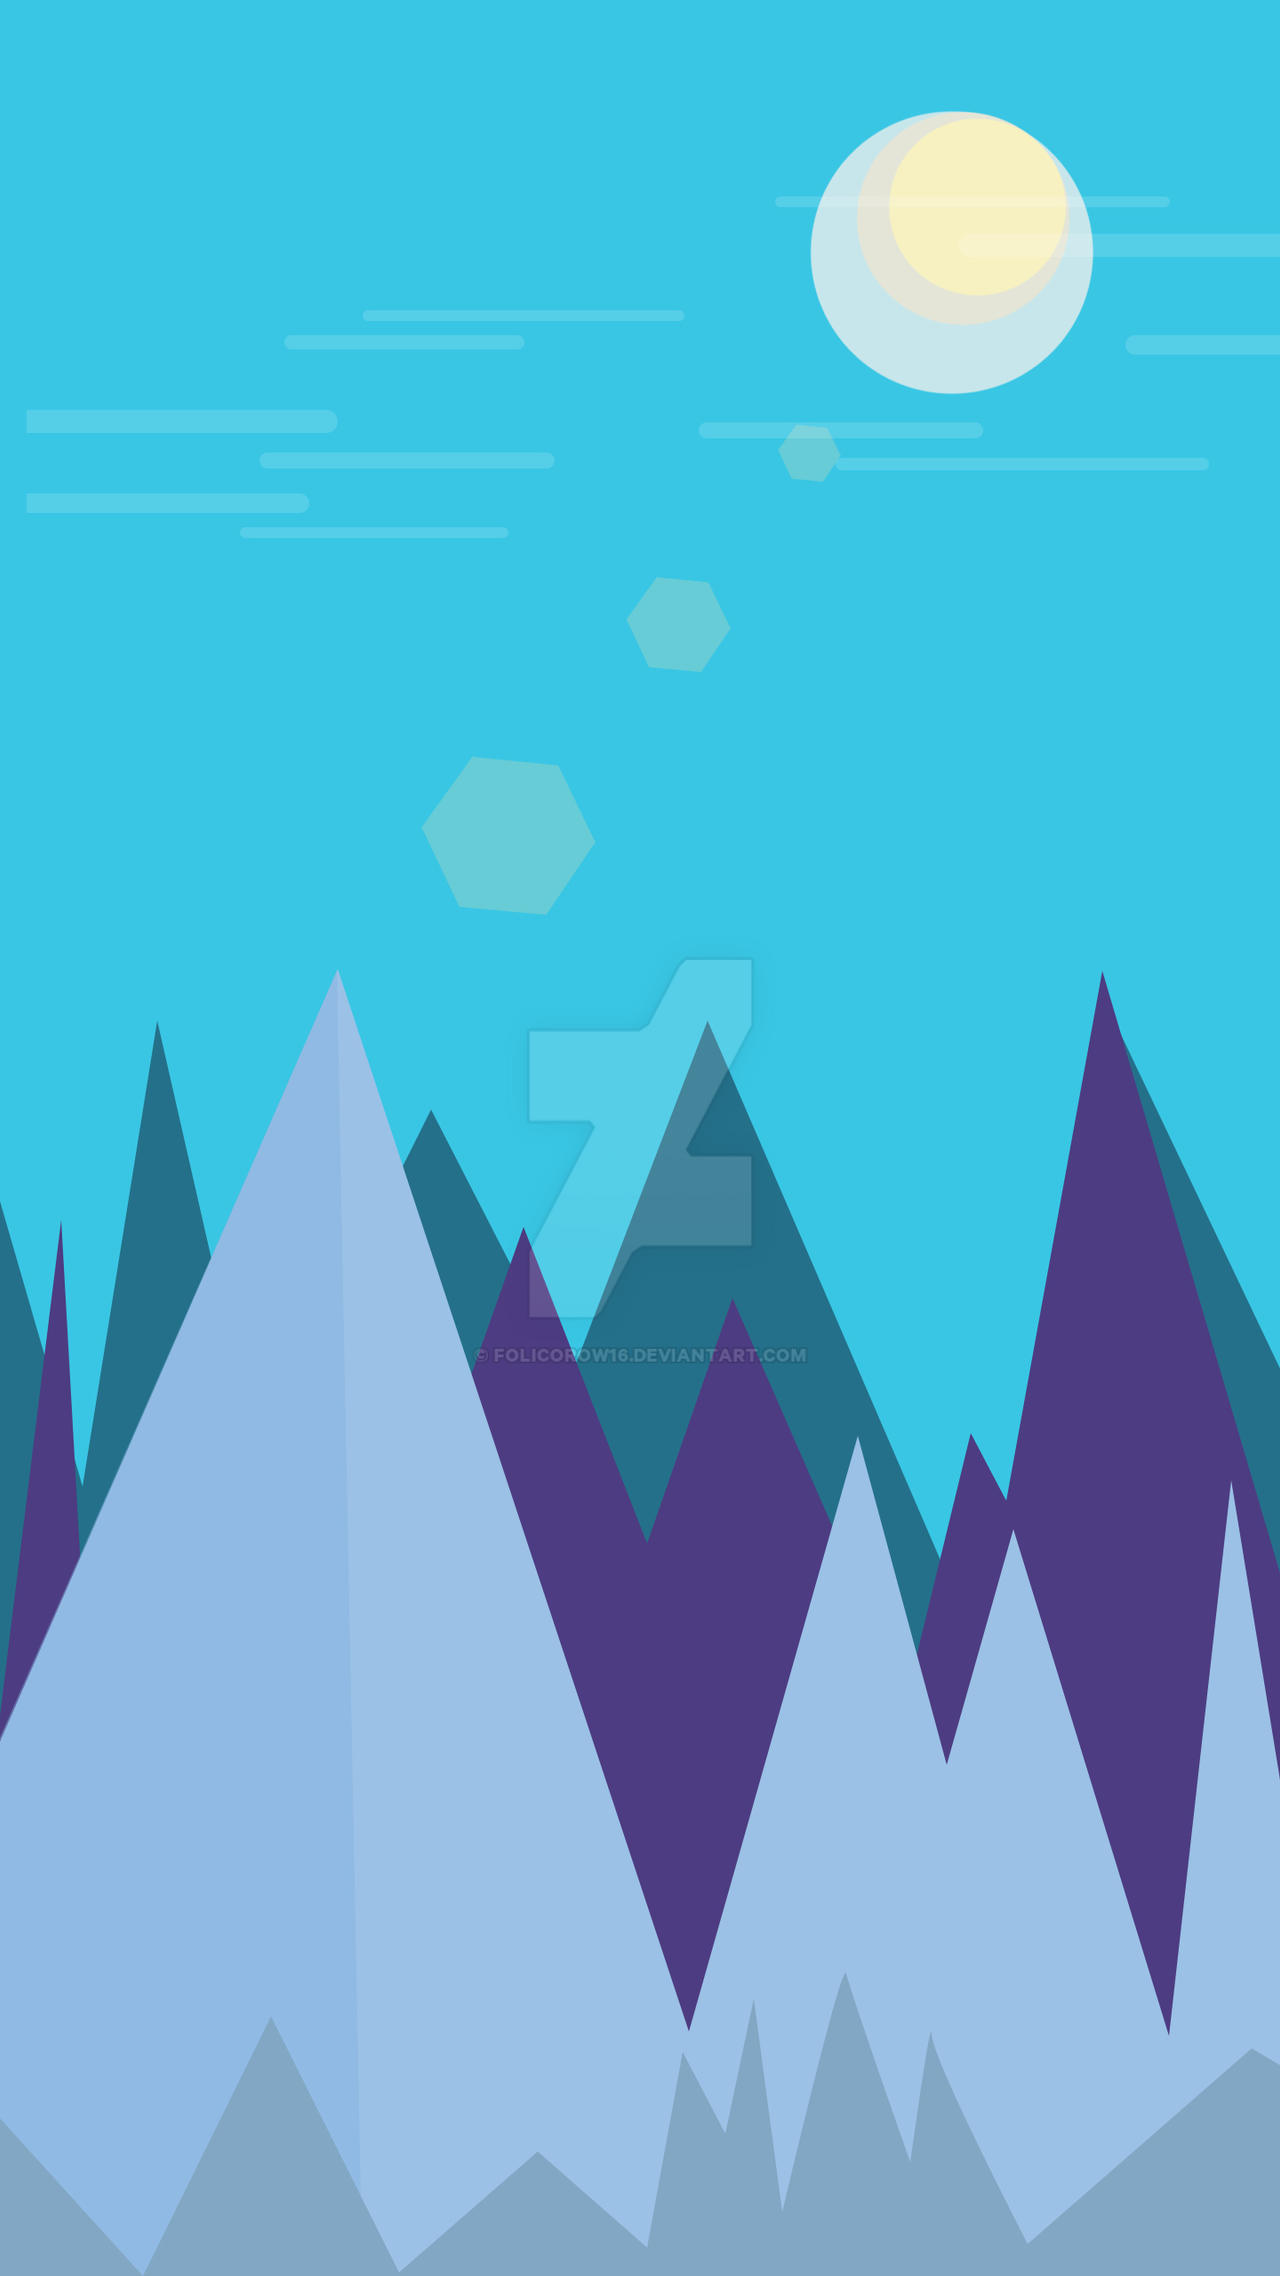 Great Wallpaper Mountain Samsung Galaxy S7 - flat_mountains_wallpaper_galaxy_s7_edge_by_folicorow16-da2wtpv  Trends_162164.jpg